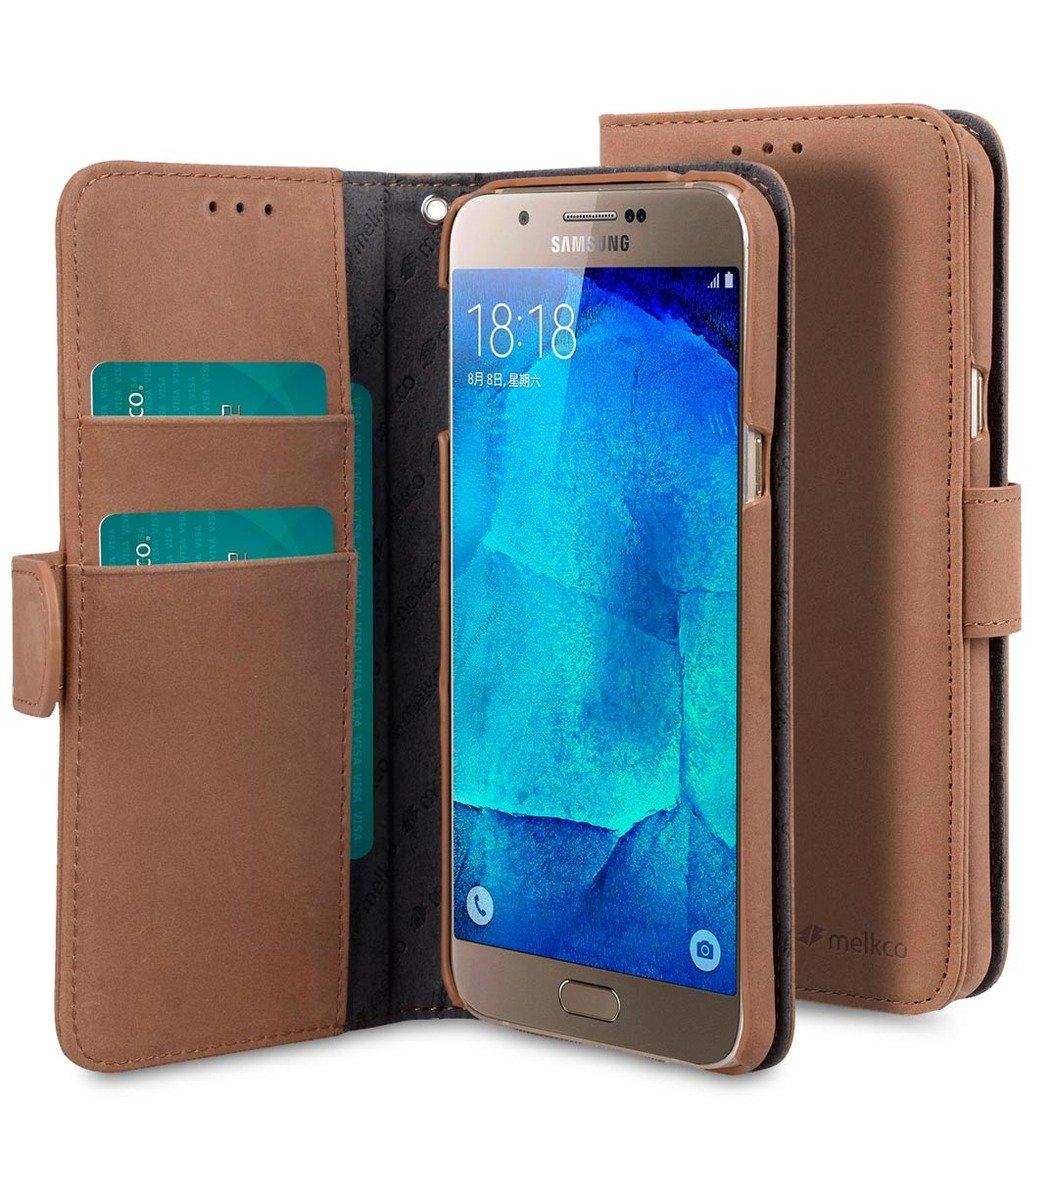 Samsung Galaxy A8 Wallet Book Type 高級真皮革手機套 - 磨沙啡色